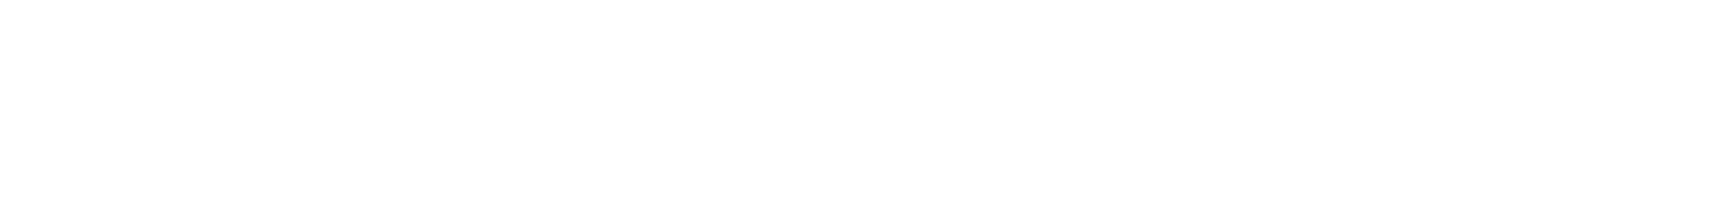 Colorbeam logo